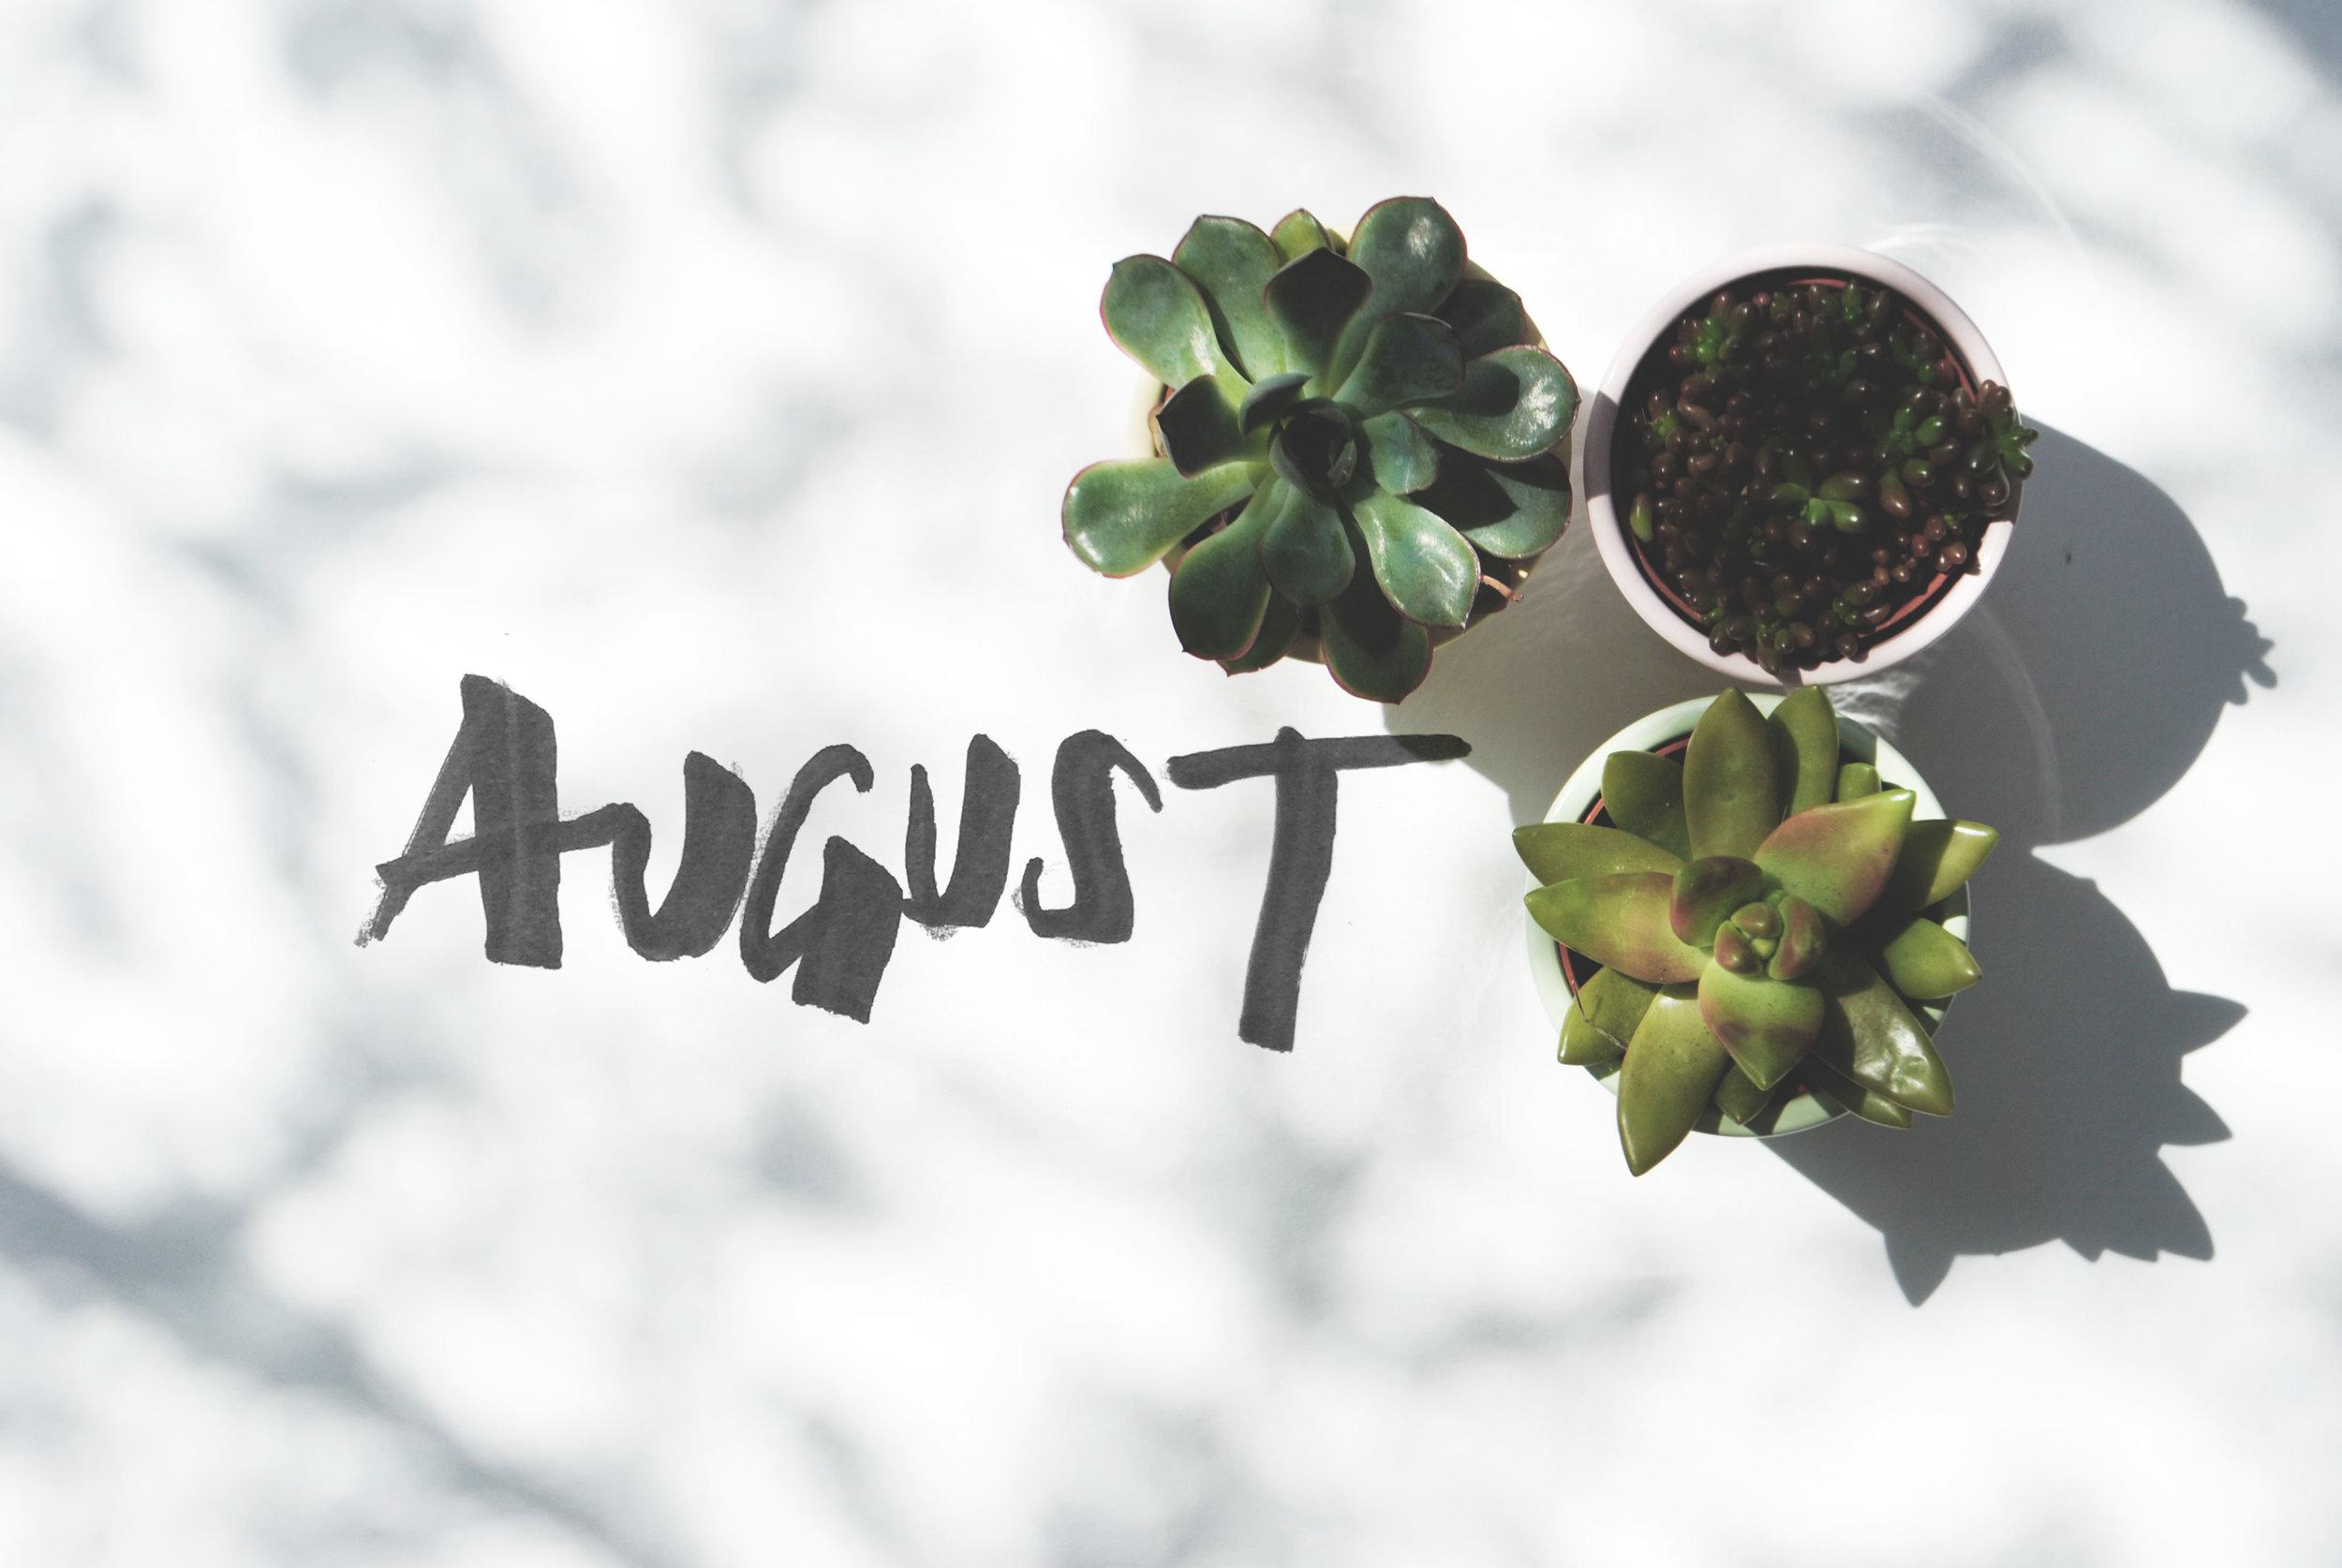 august-hand-drawn-type.jpg